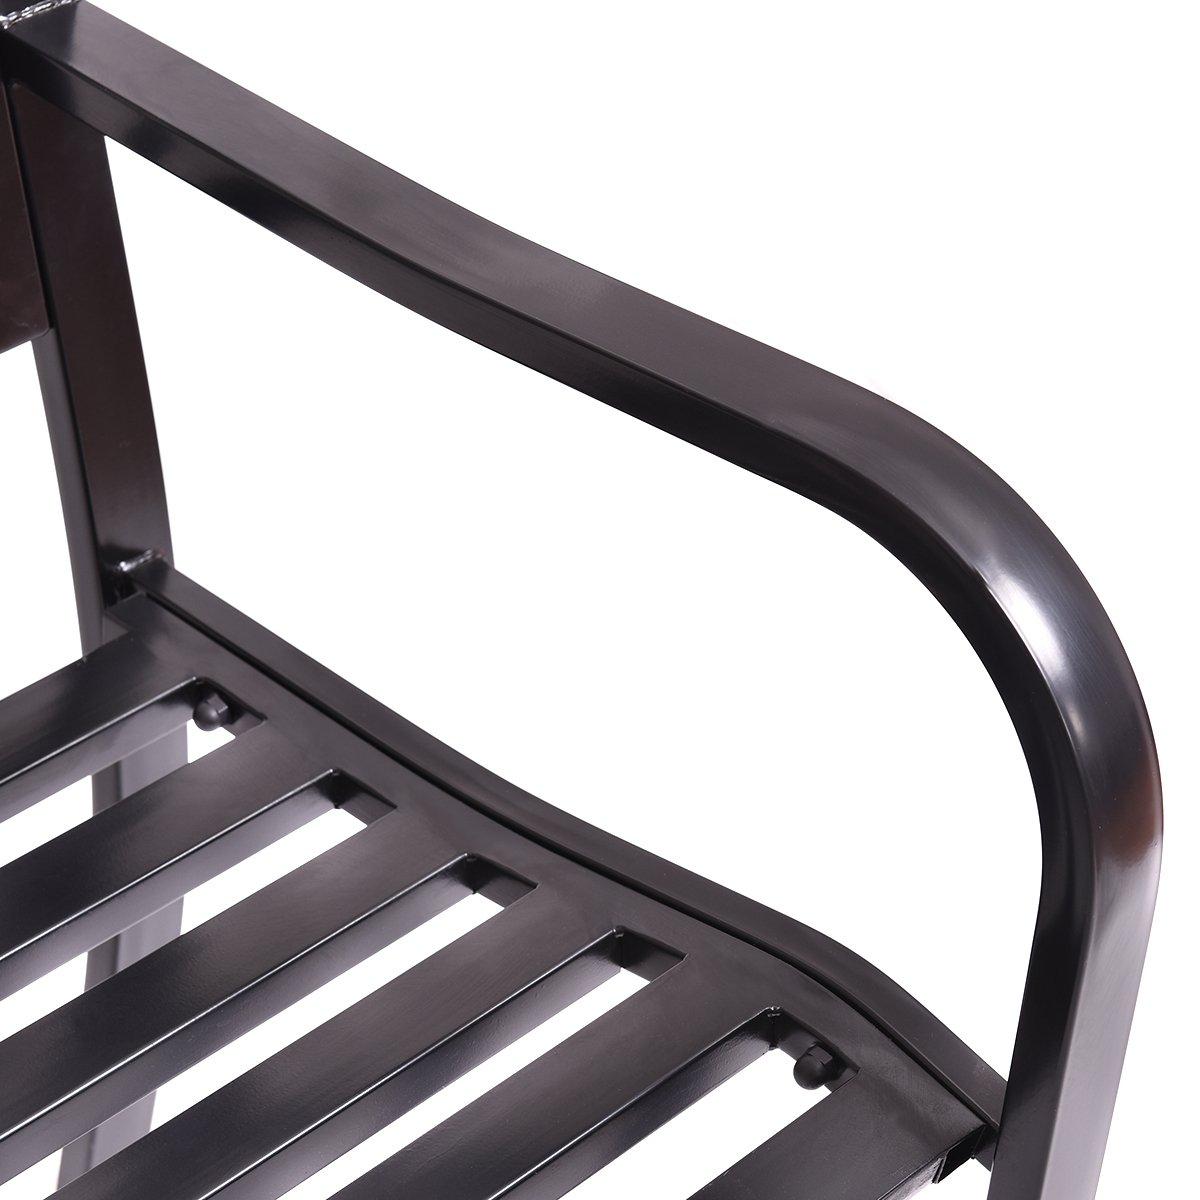 Giantex 50'' Patio Garden Bench Loveseats Park Yard Furniture Decor Cast Iron Frame Black (Black Style 1) by Giantex (Image #9)